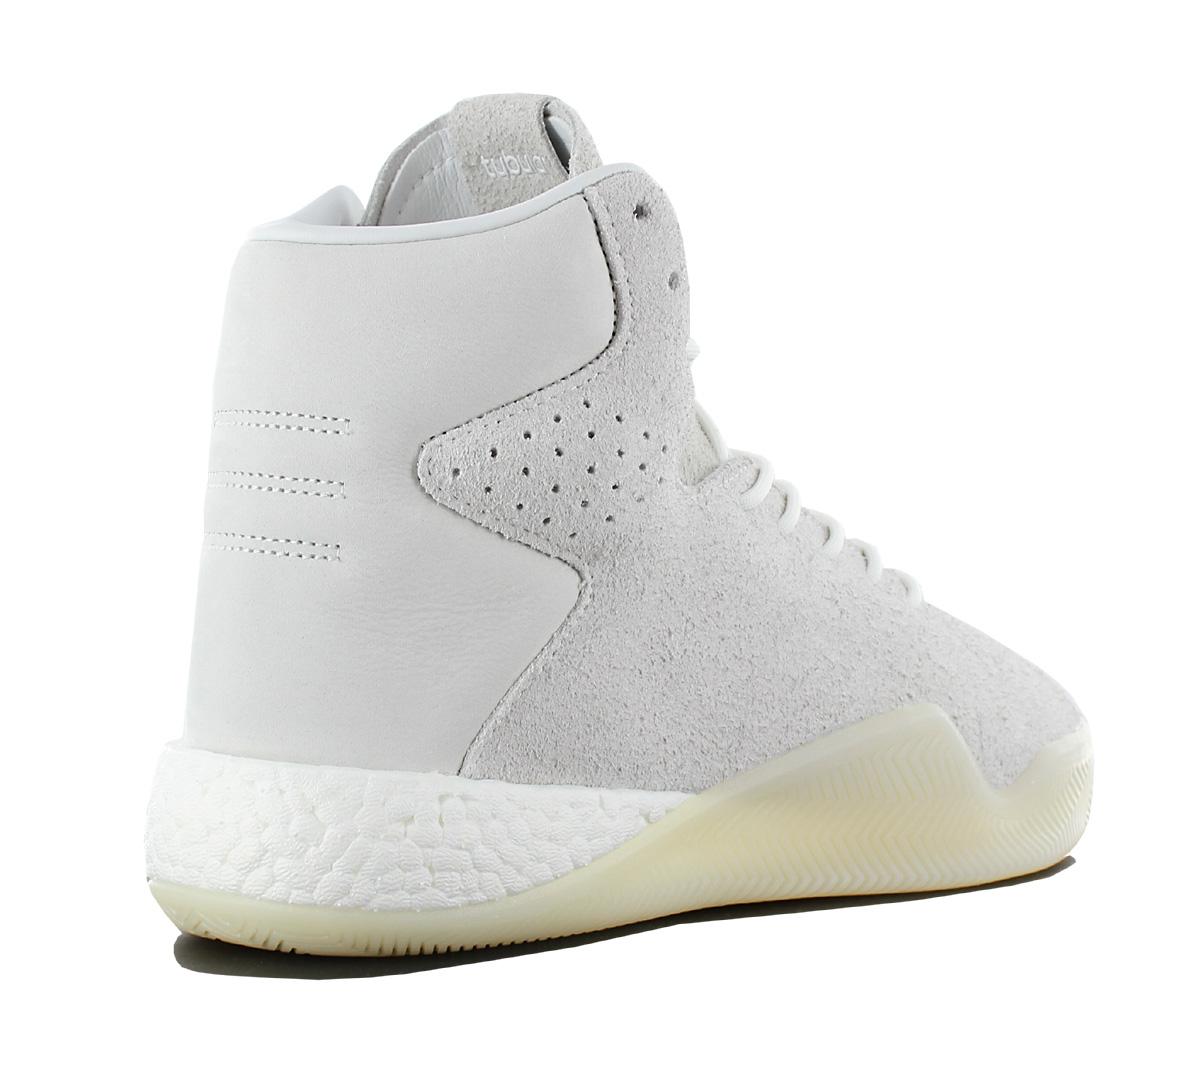 e737cc394b0af Adidas Originals Tubular Instinct Boost Uomo Scarpe Sneaker pelle ...